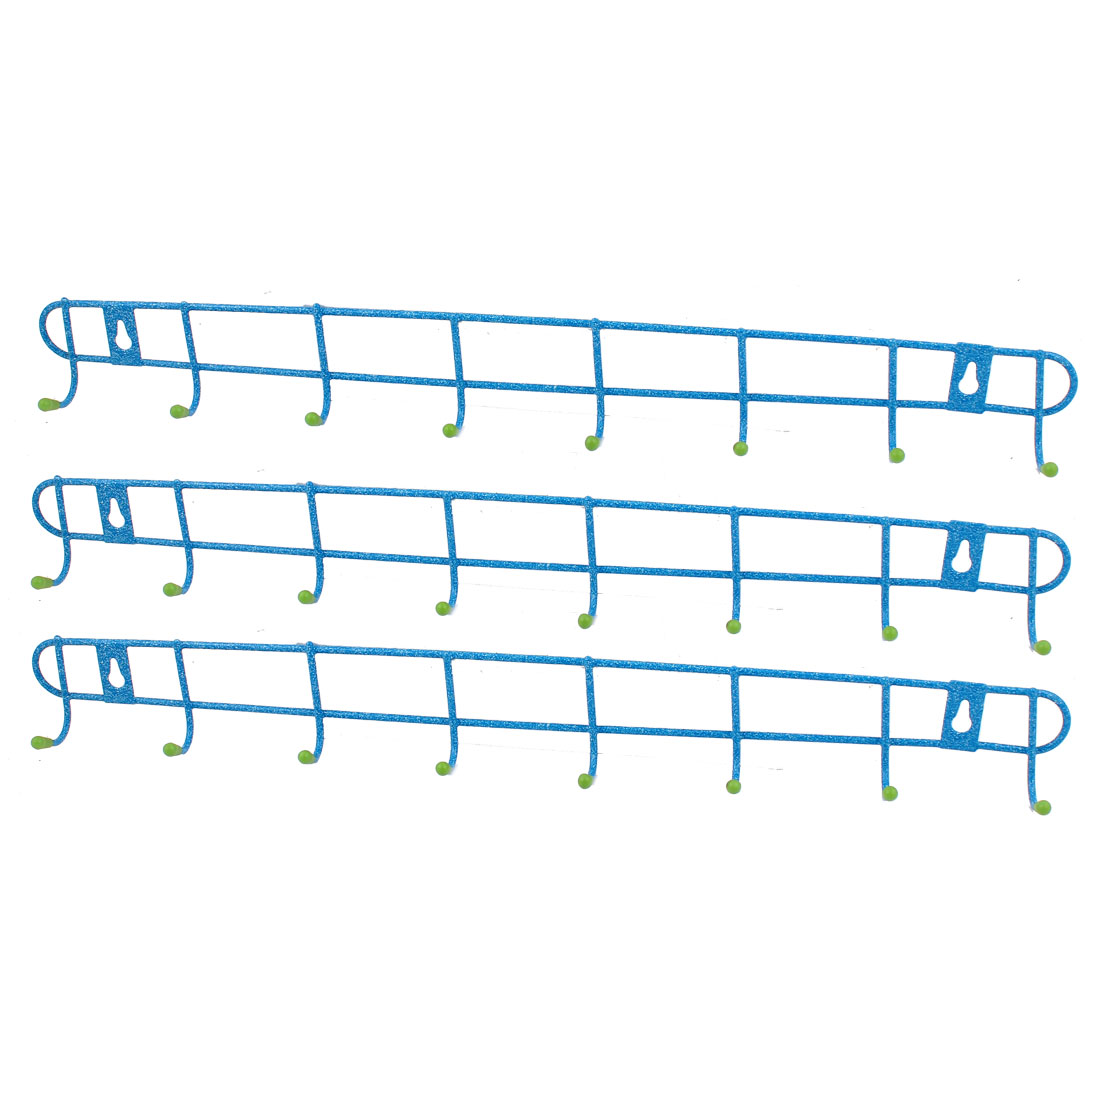 Metal 8 Hooks Bedroom Bathroom Kitchen Hat Coat Towel Wall Hanger Rack Holder 3PCS